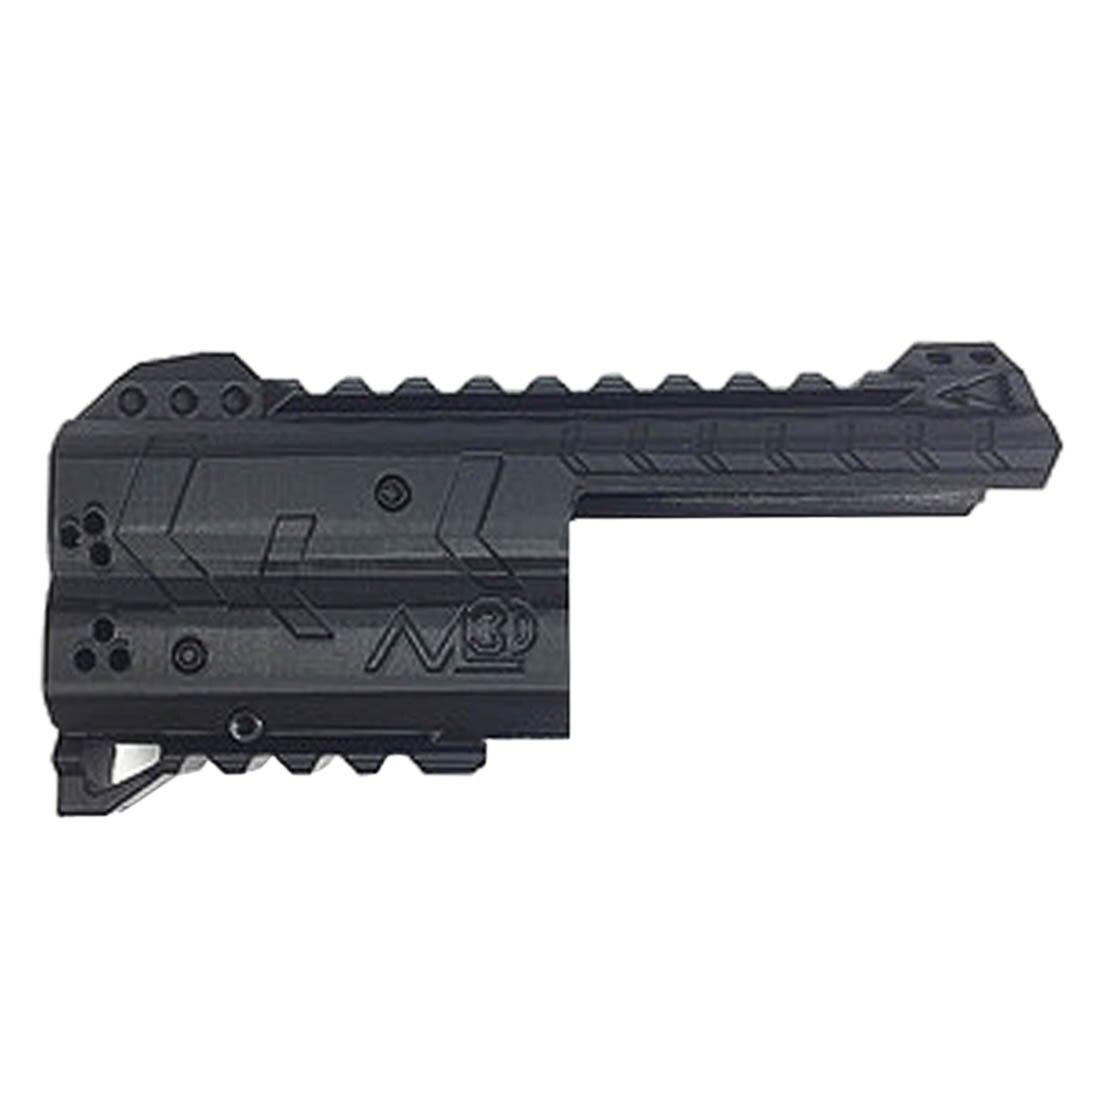 купить Maliang Appearance Modification 3D Printing Front Tube A-3.0 Decoration Part for Nerf Zombie Strike Doublestrike Blaster по цене 1242.99 рублей